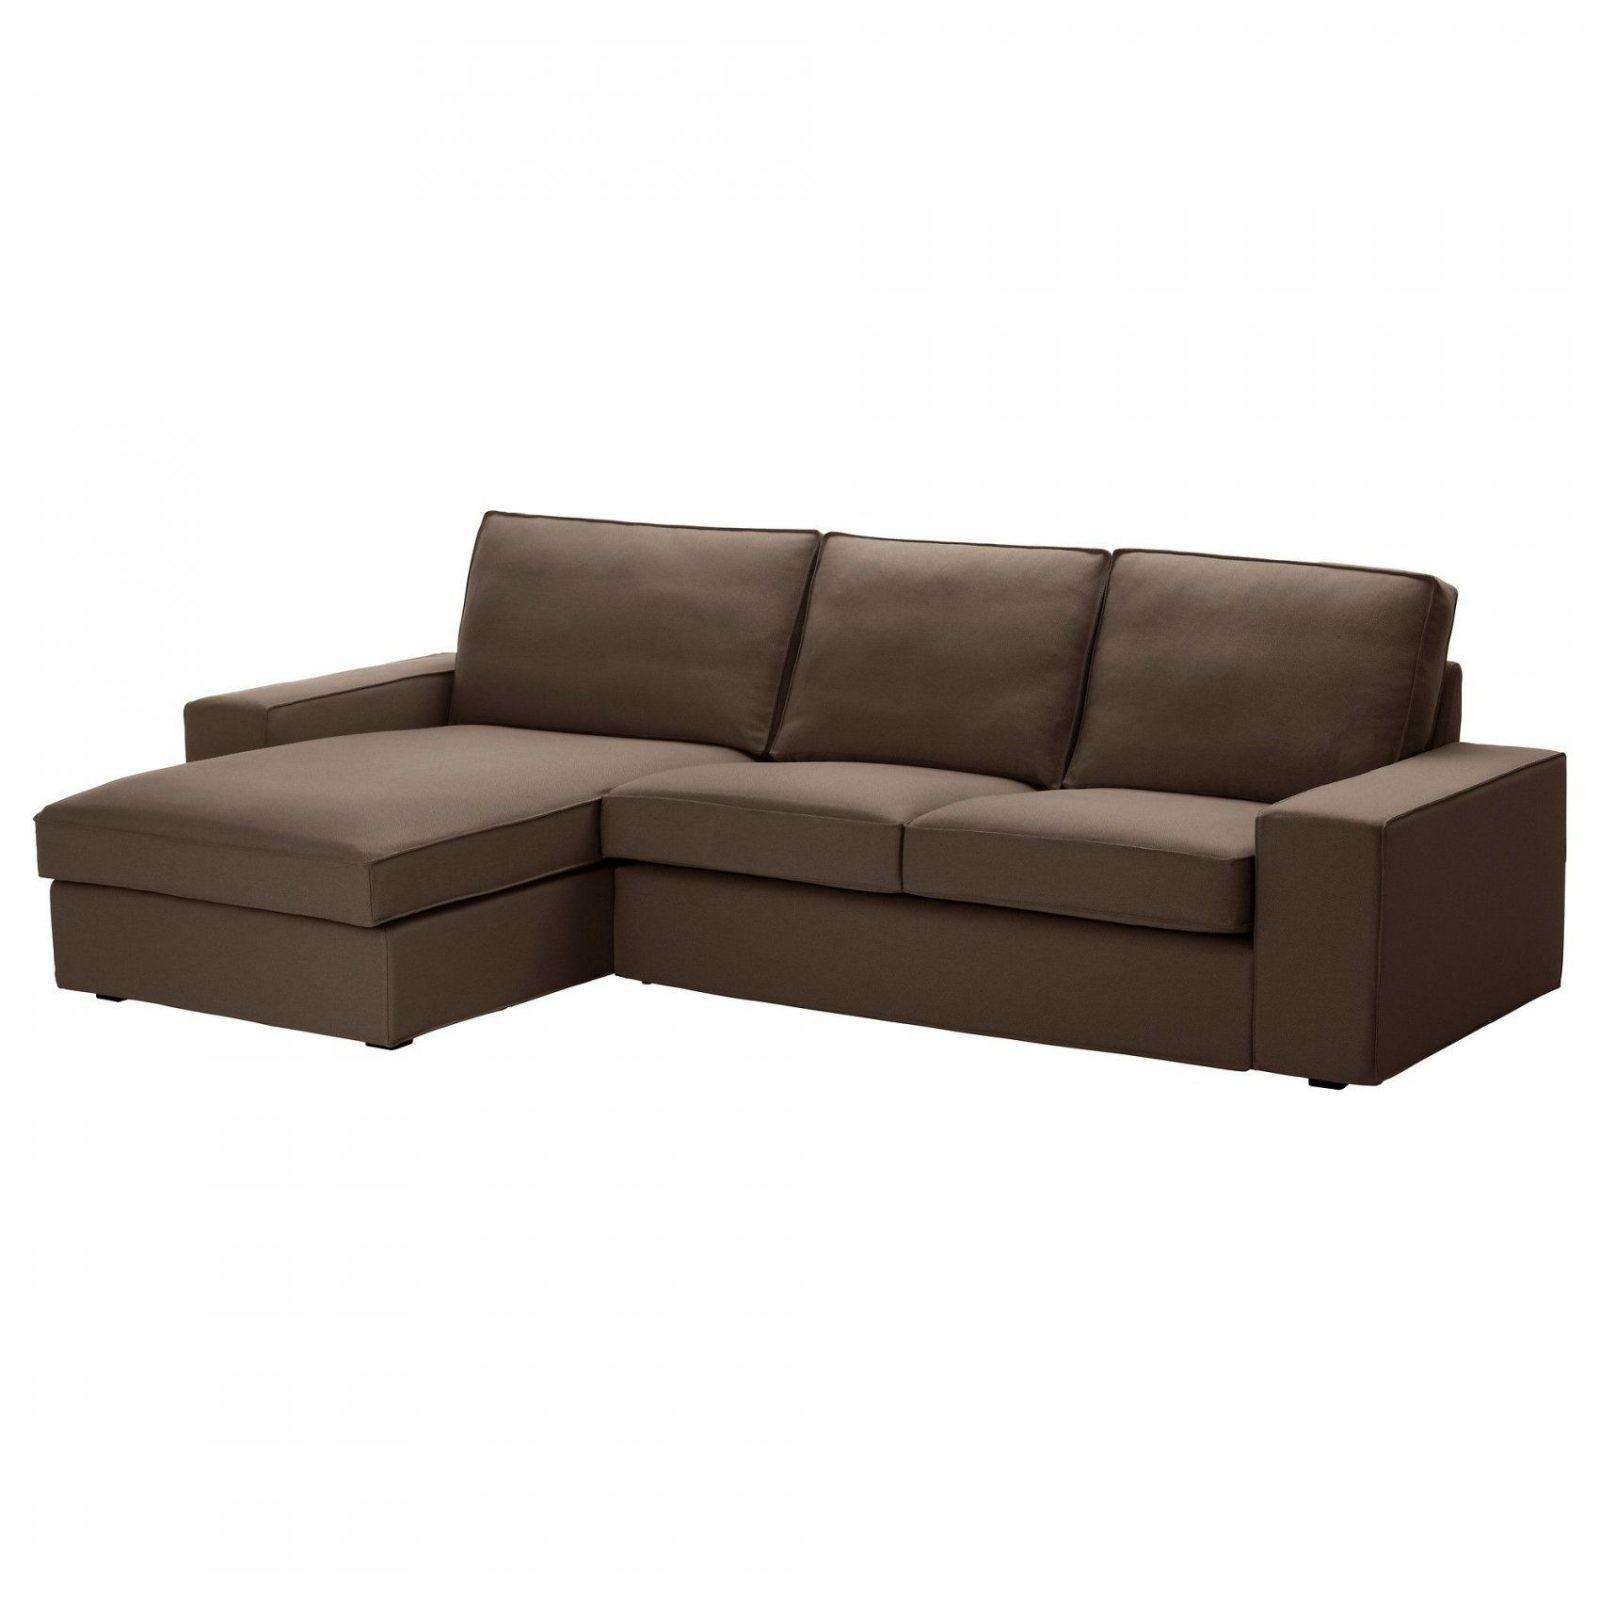 Ikea Sofa Mit Schlaffunktion Kivik 2 Seter Sofa Og Sjeselong von Ikea Sofa Mit Schlaffunktion Bild